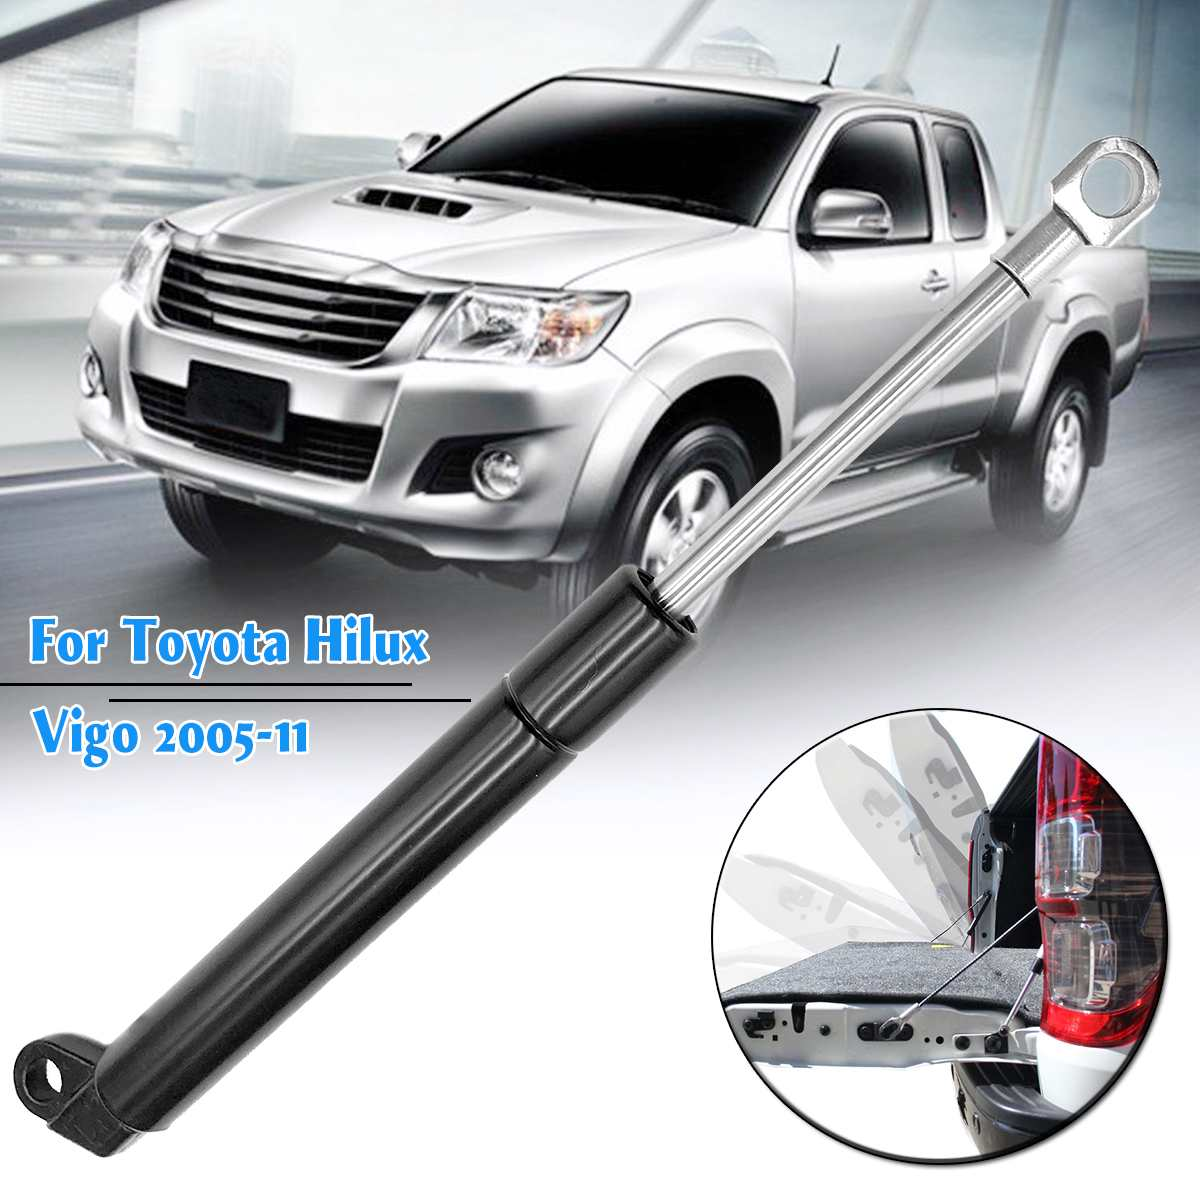 1Pcs Tailgate ช้าลงประตูท้ายหาง Strut Damper ฤดูใบไม้ผลิก๊าซสำหรับ Toyota Hilux Vigo 2005 2006 2007 2008 2009 2010 2011